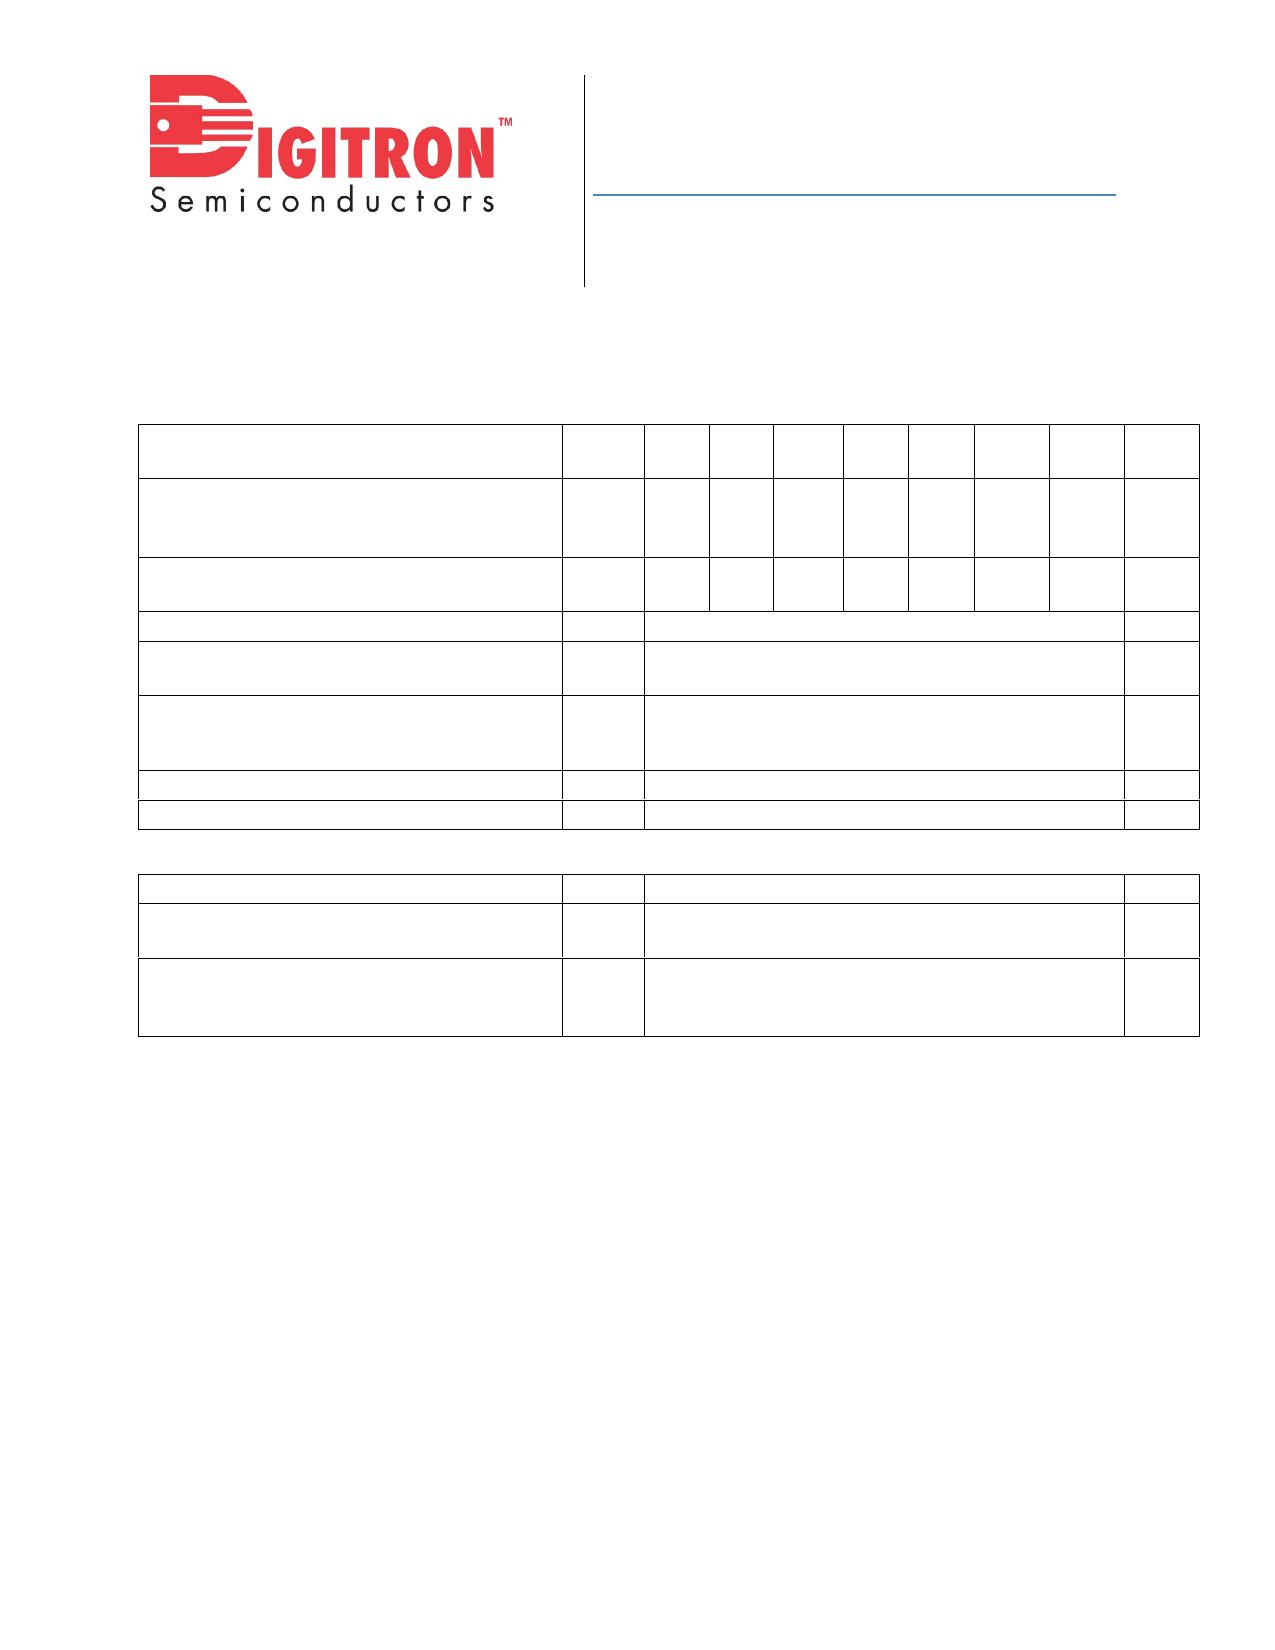 MR2001 데이터시트 및 MR2001 PDF